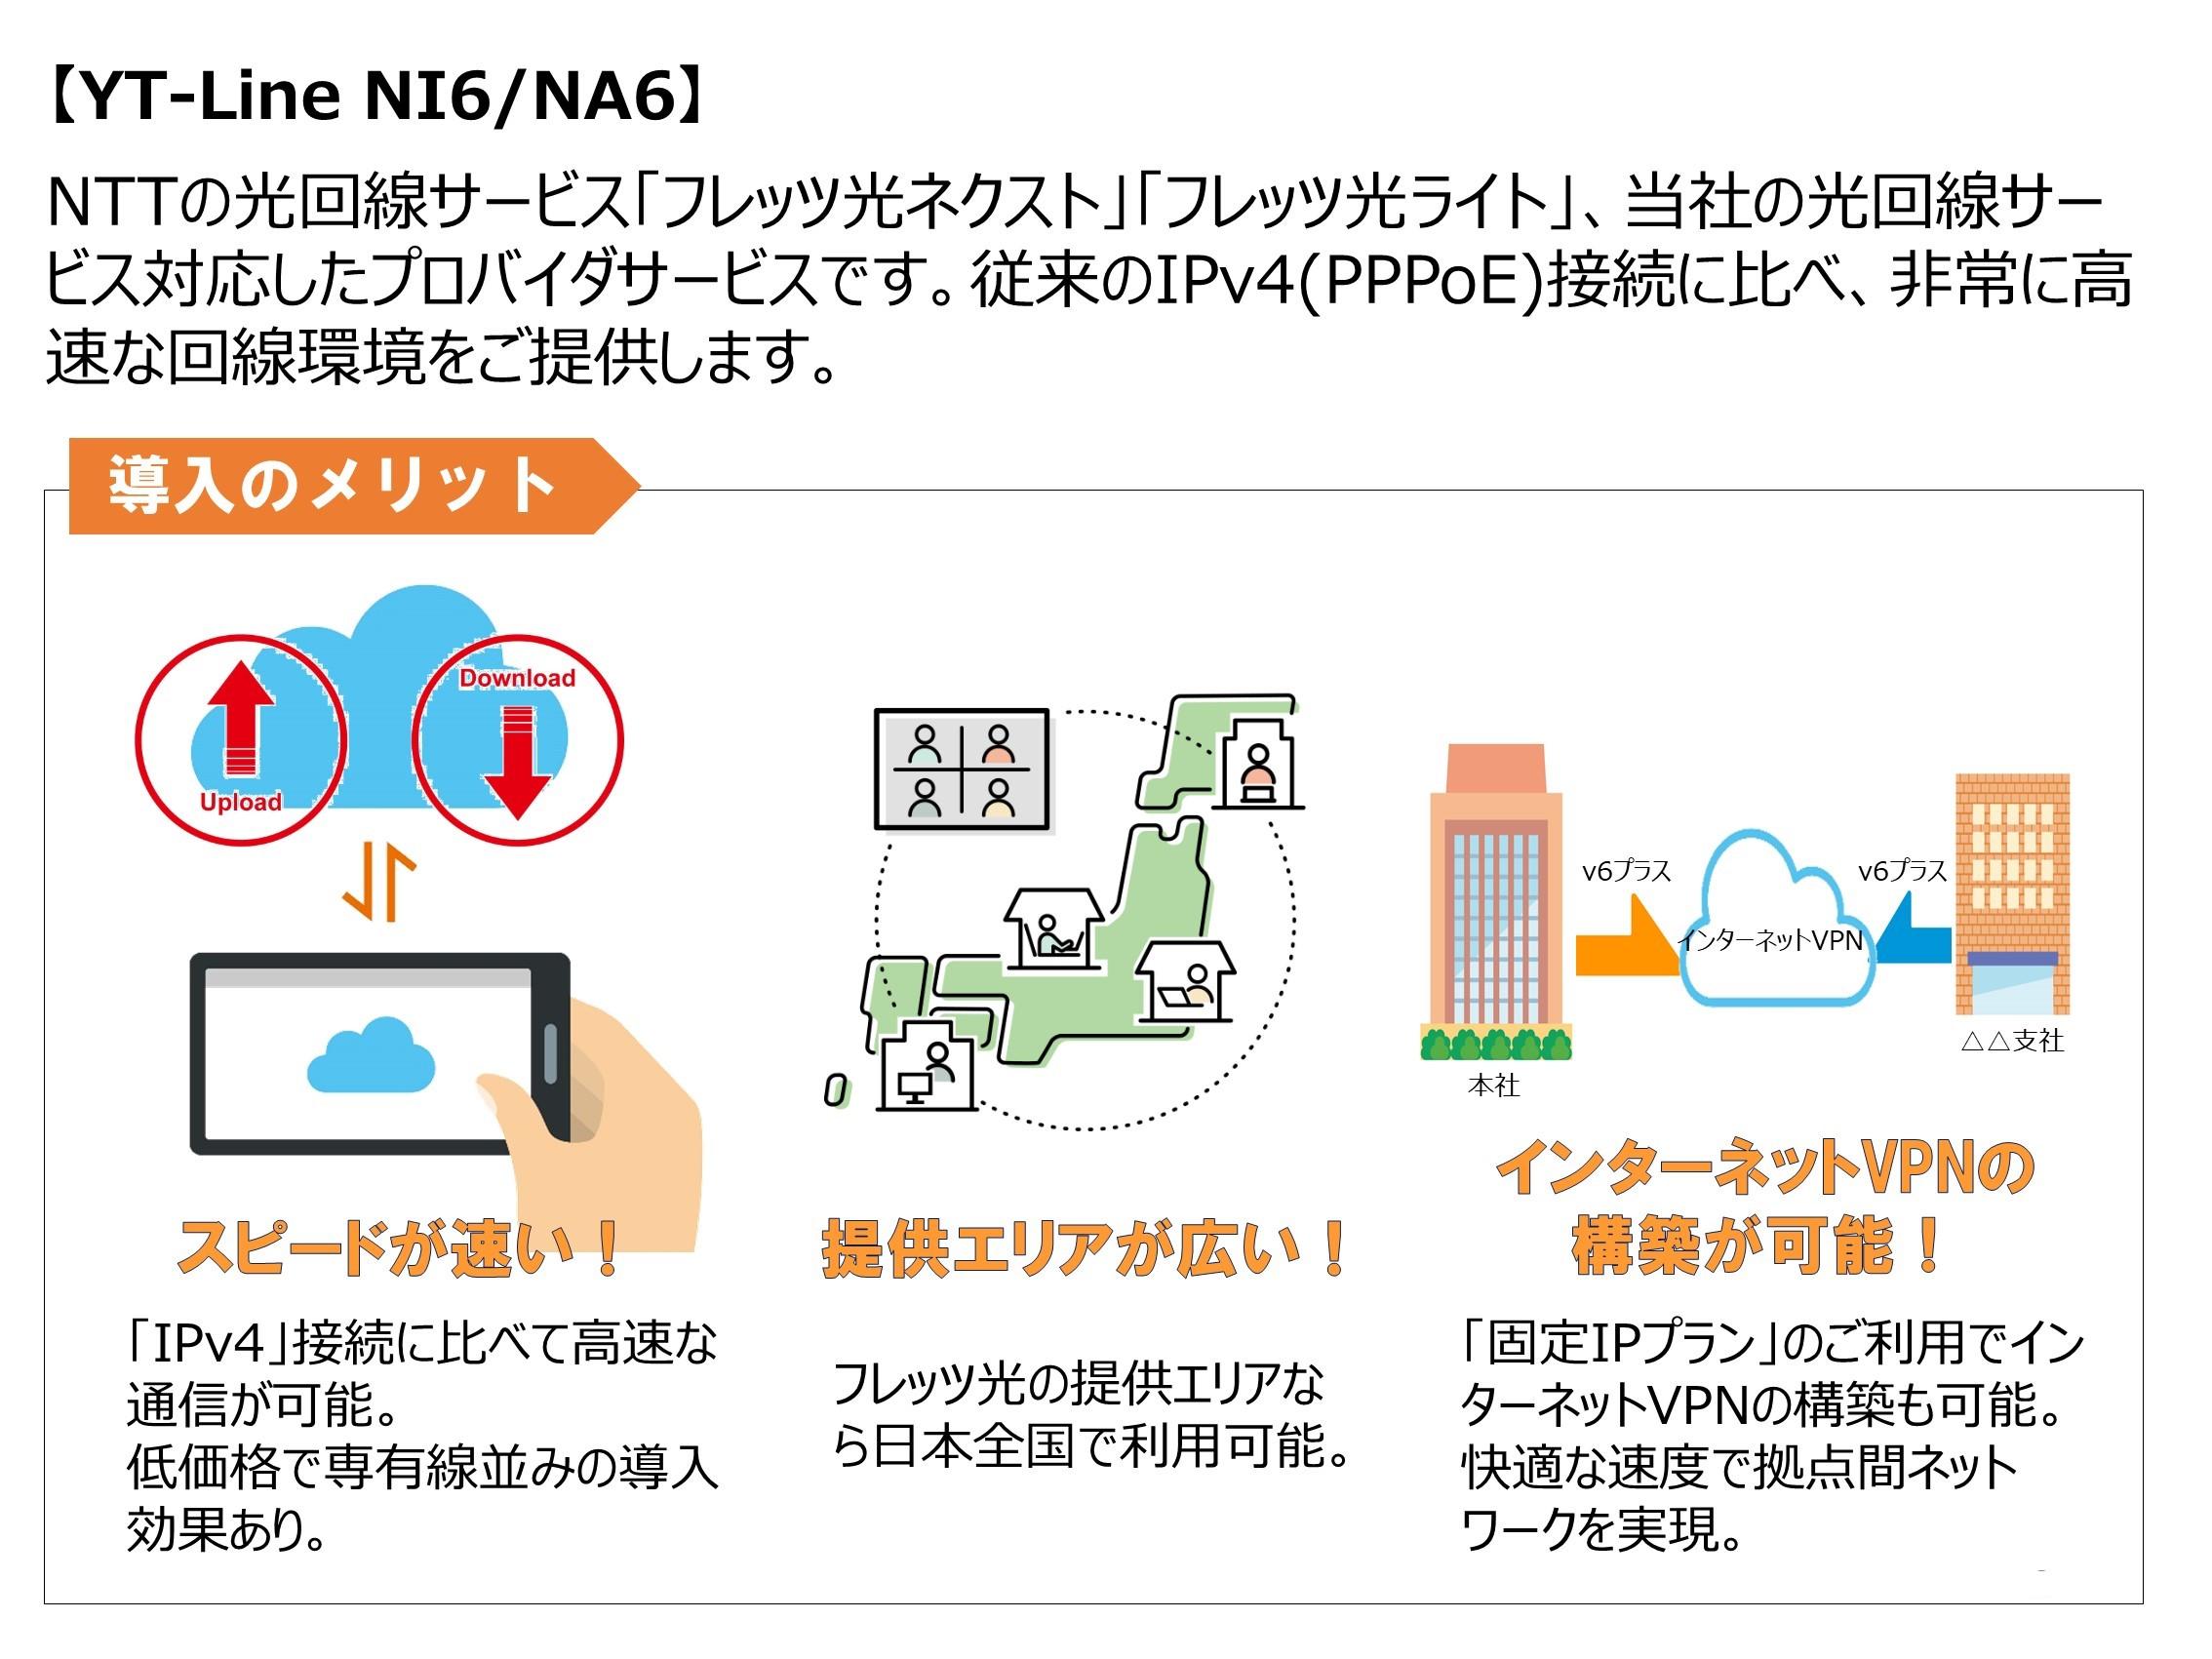 IPv6対応接続サービス「YT-Line NI/NA6」提供開始のご案内